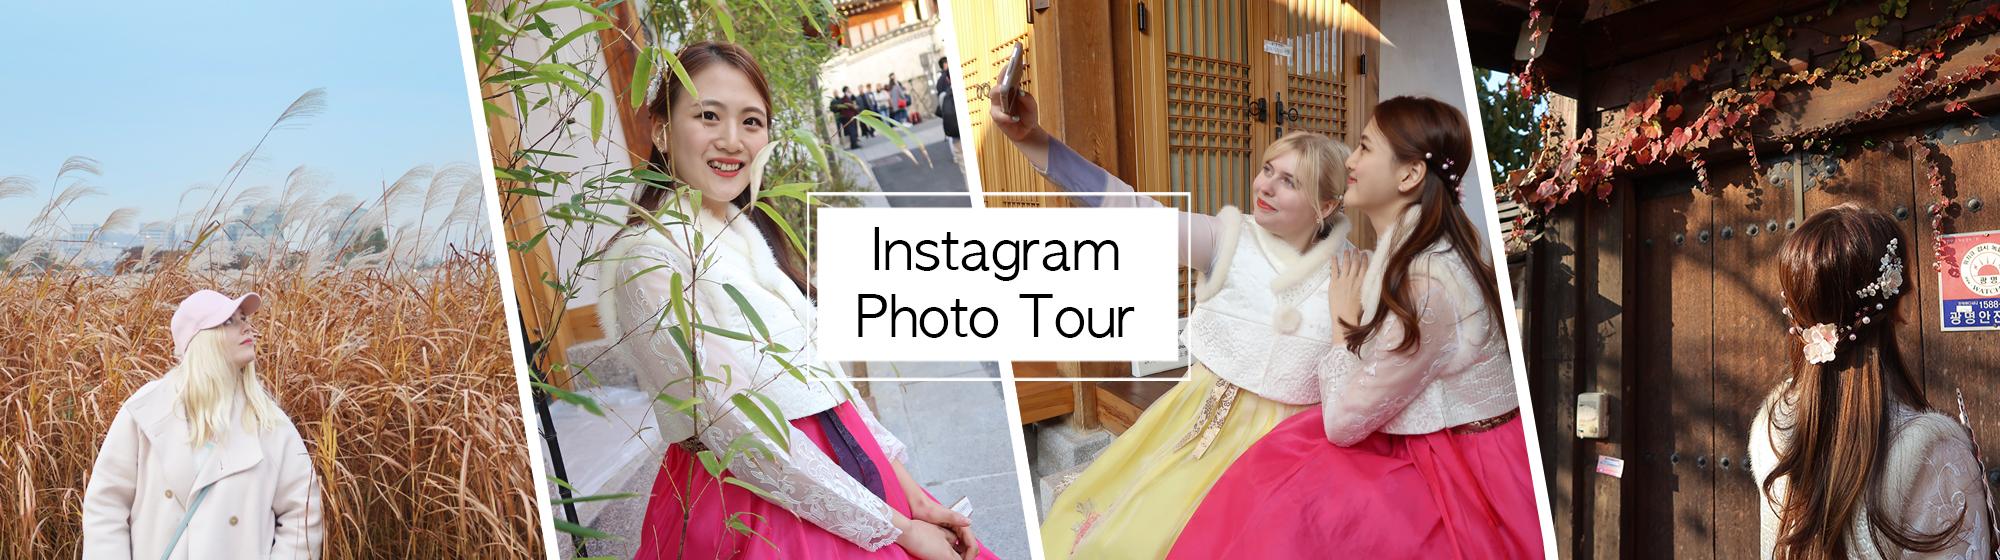 Instagram Photo Spots in Seoul – Small Group Tour | KoreaTravelEasy